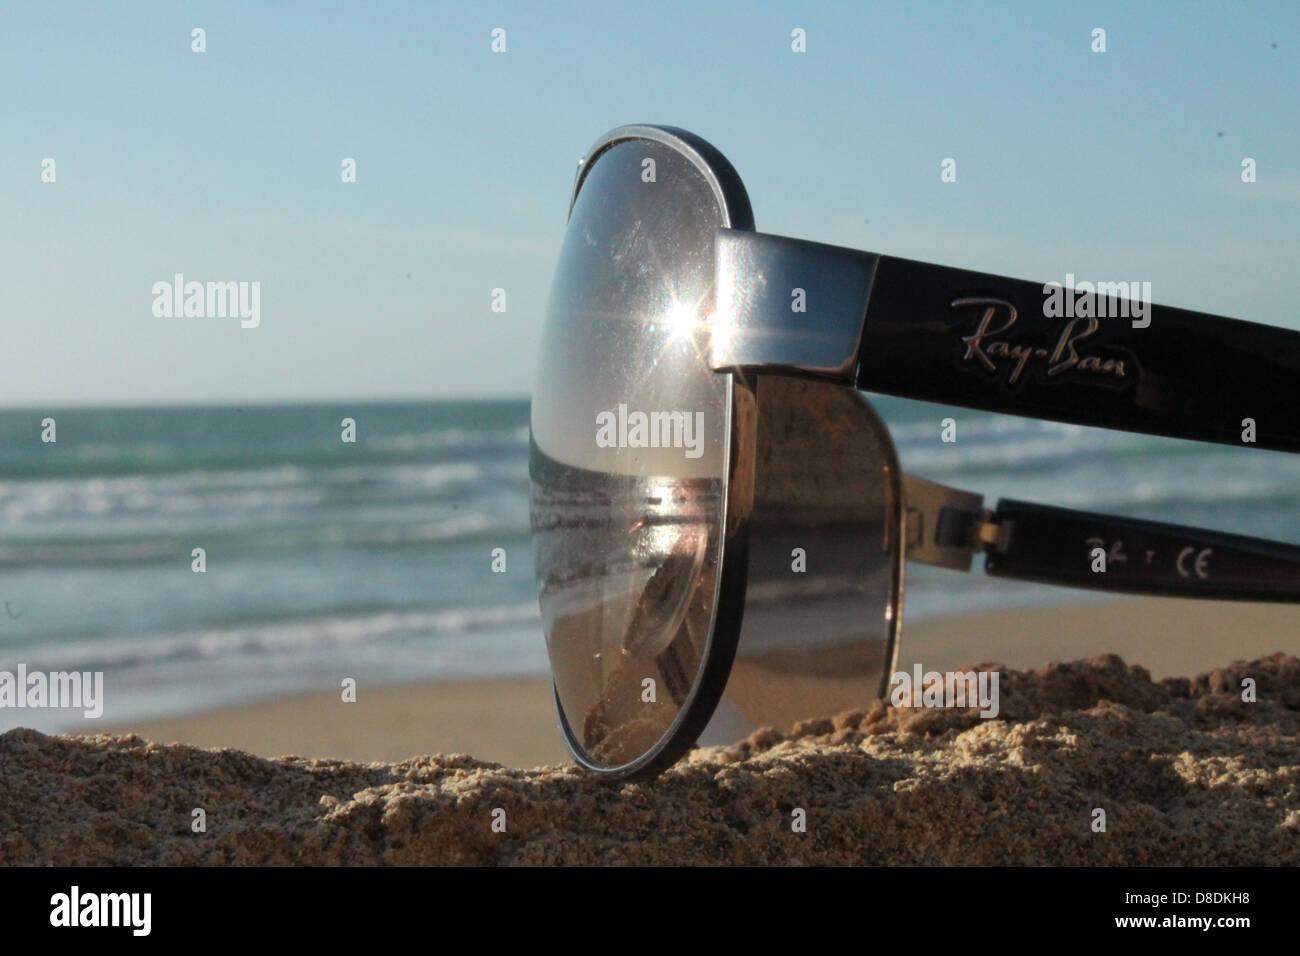 ray ban sunglass beach water - Stock Image